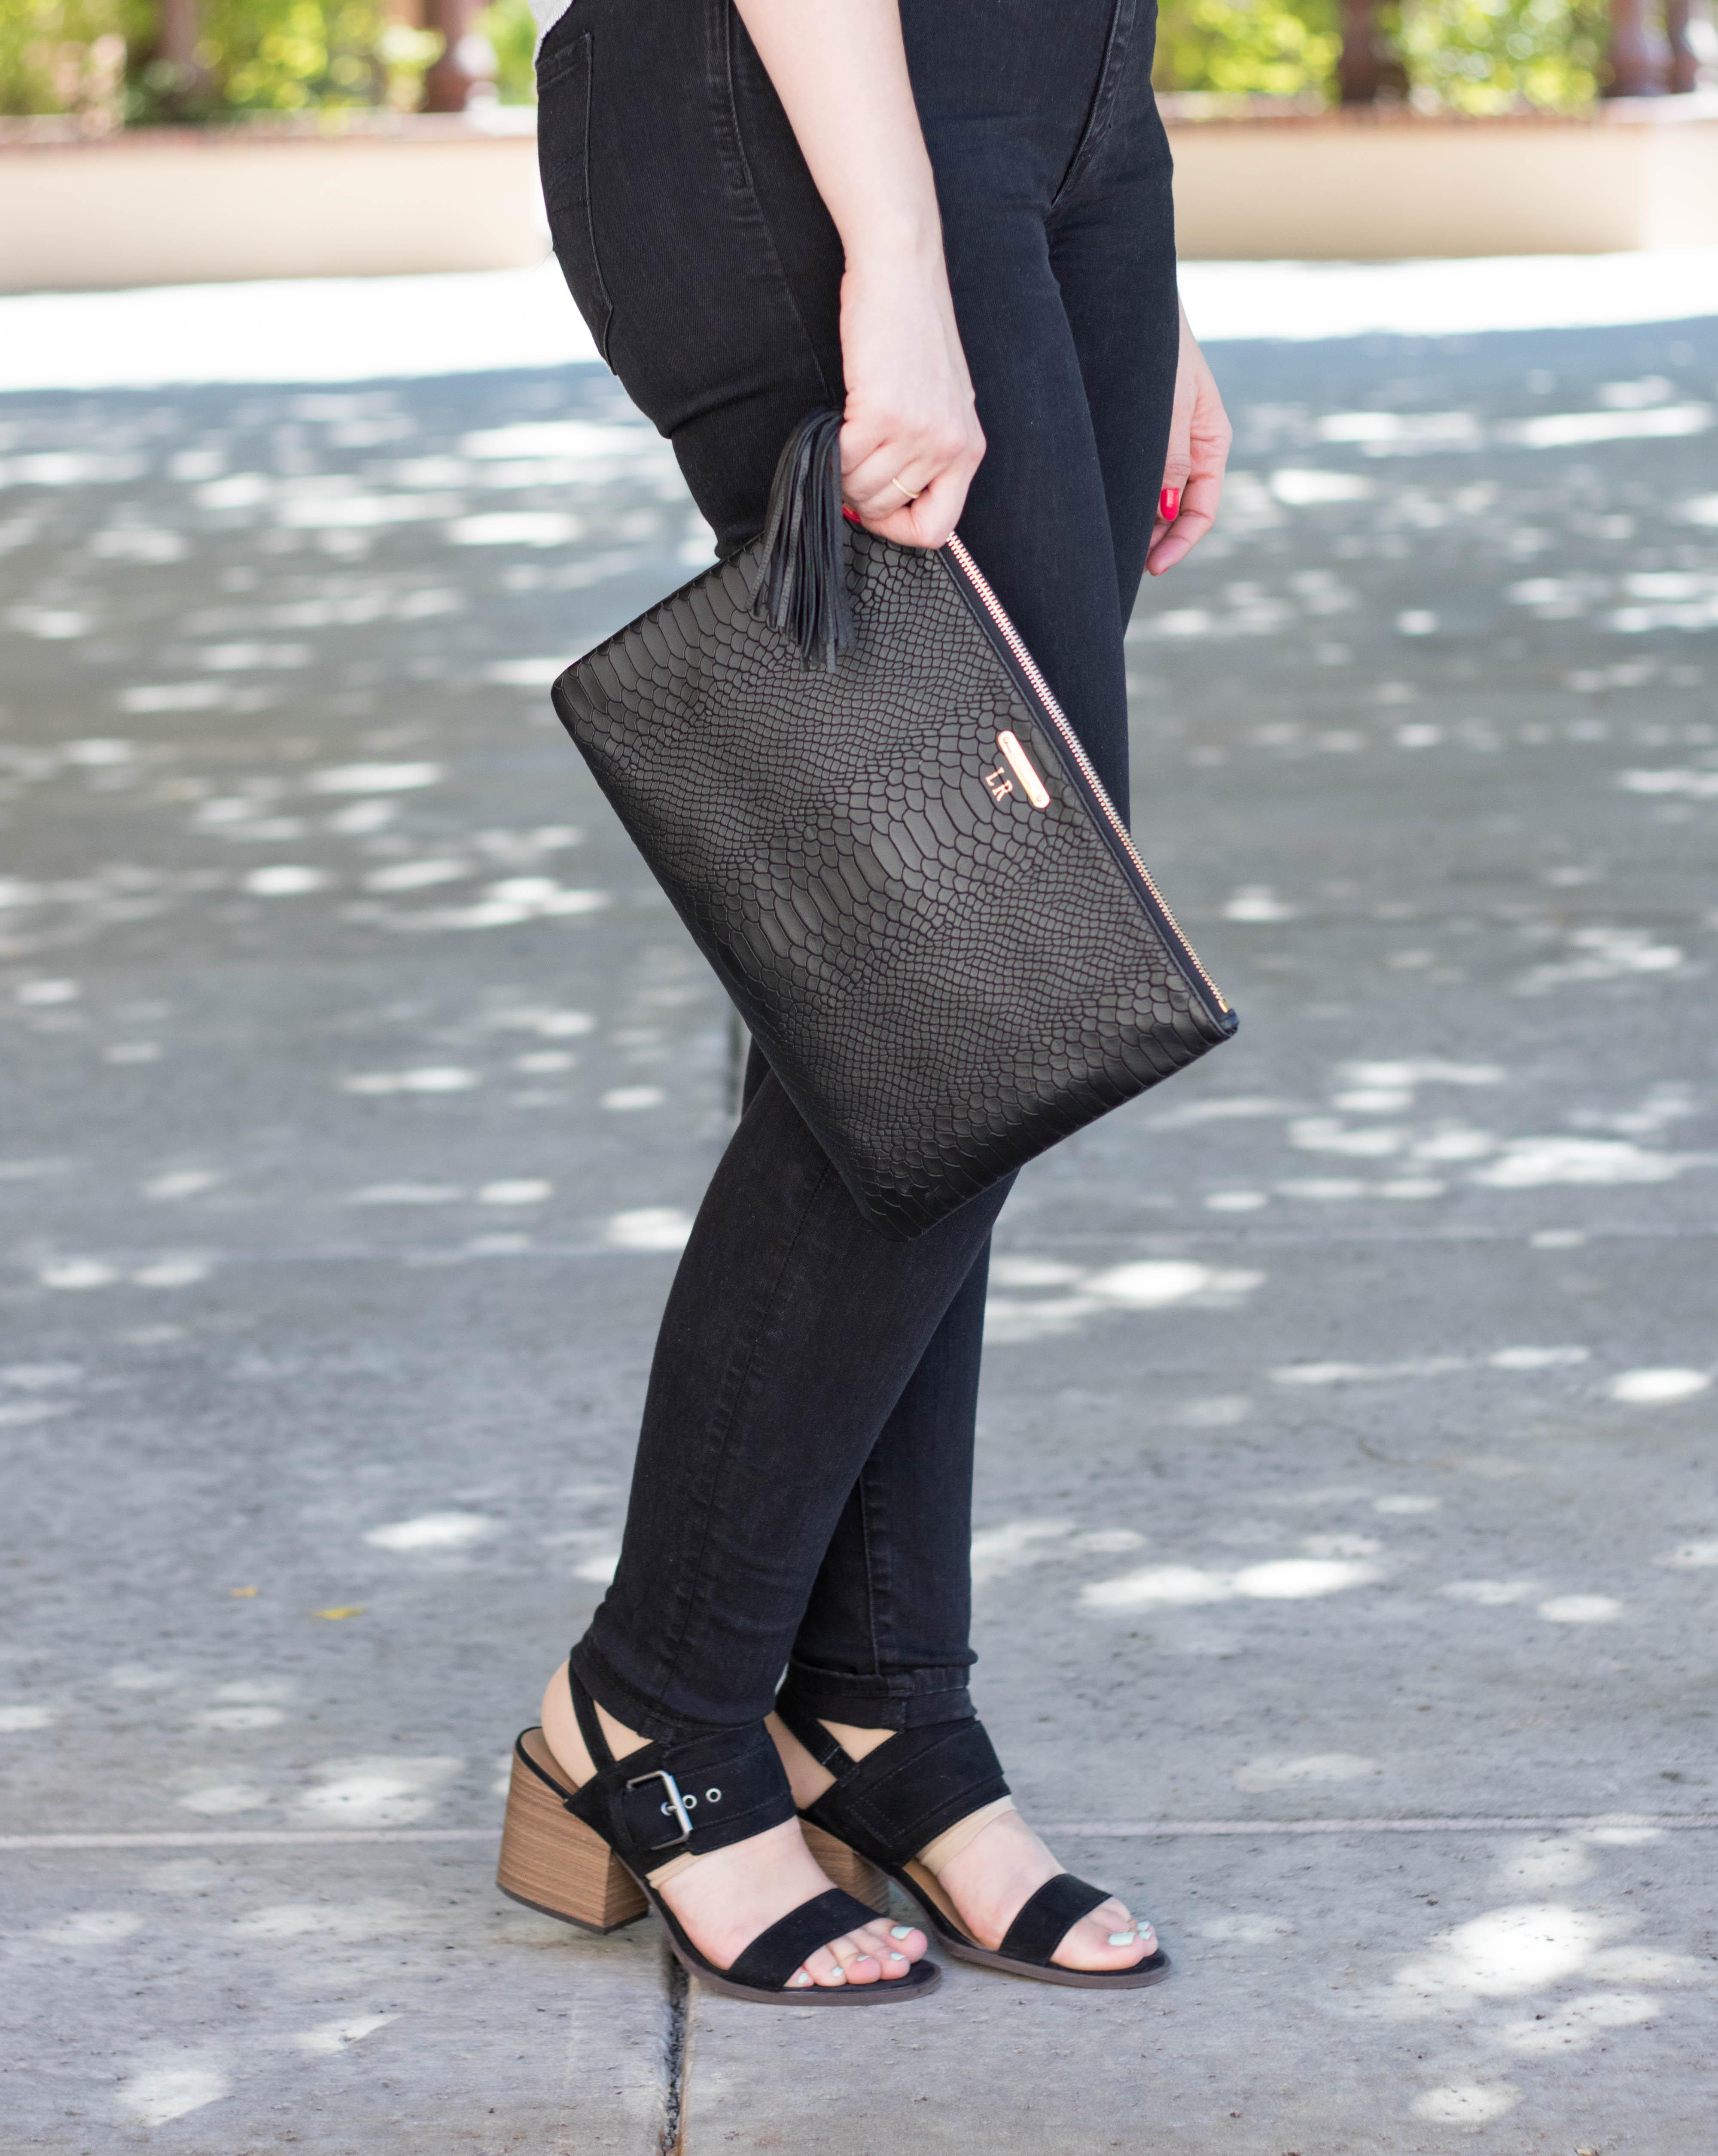 black heels to wear into fall #targetstyle #blackheels #giginewyork #targetdoesitagain